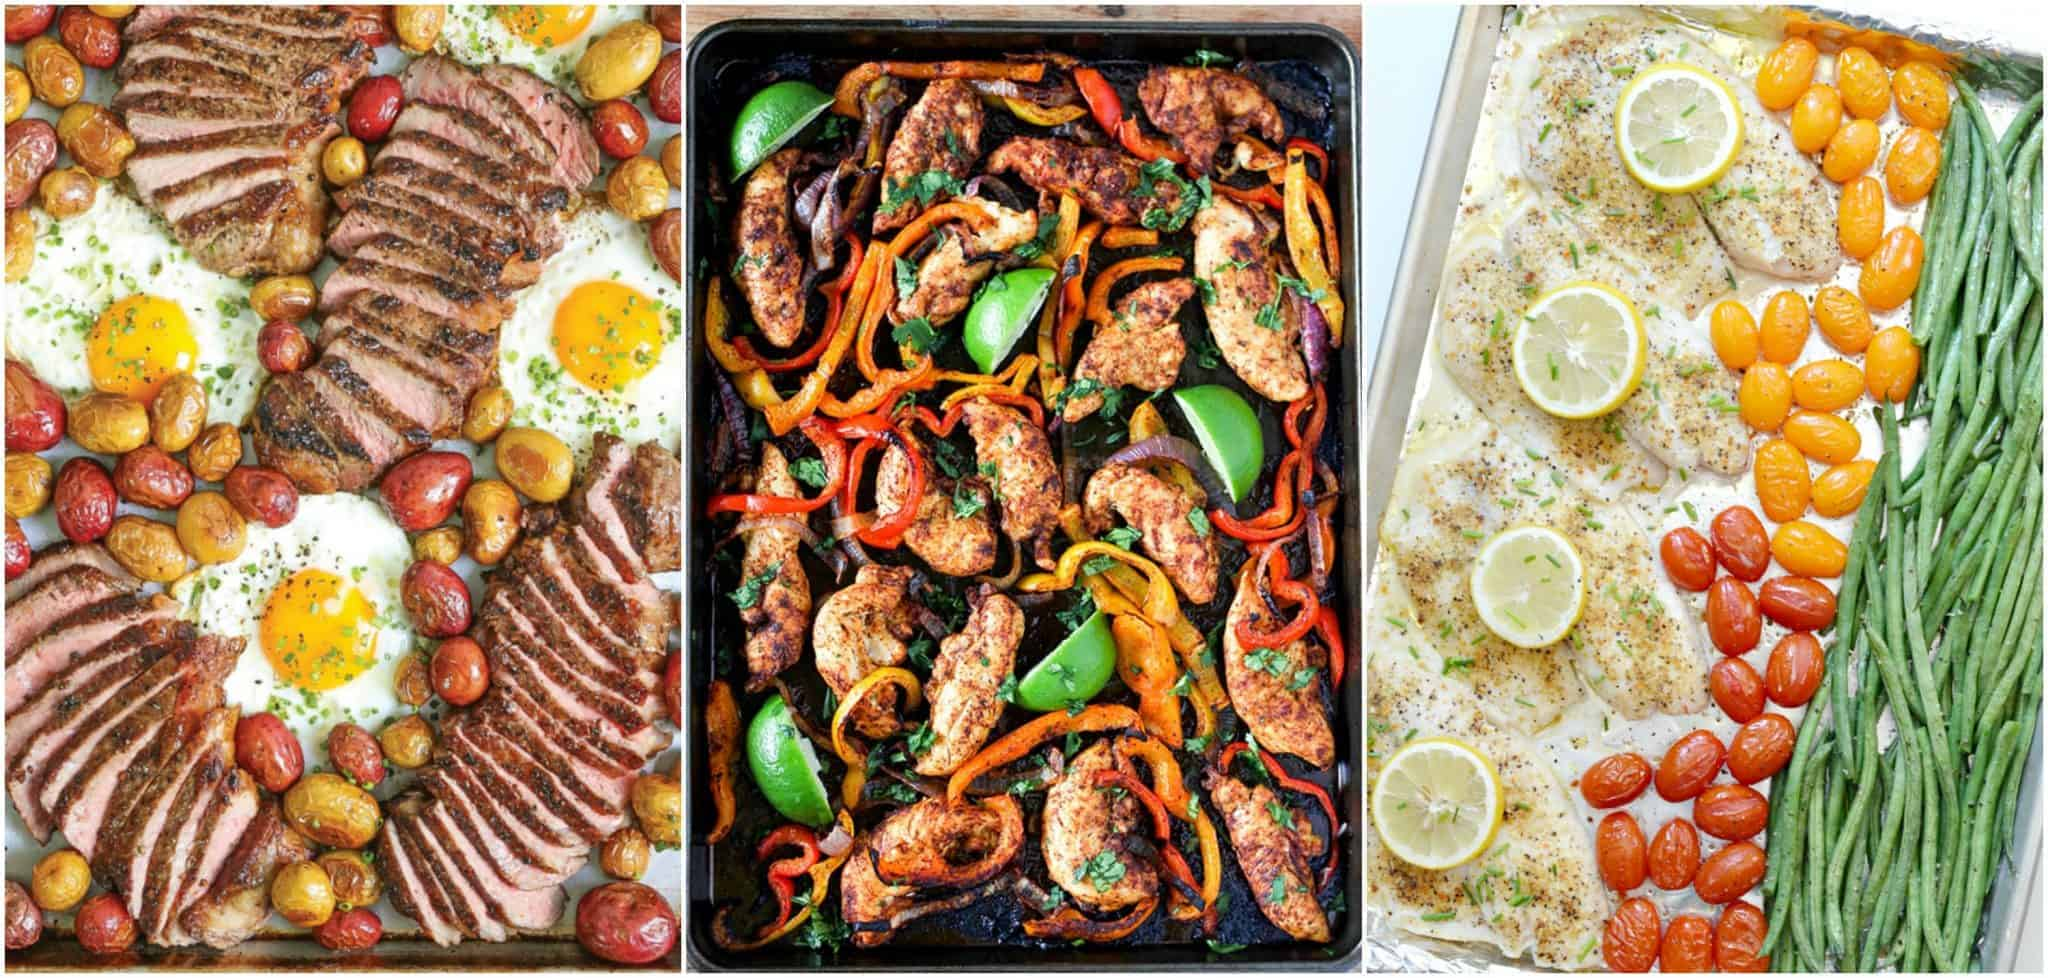 sheet pan dinners recipes